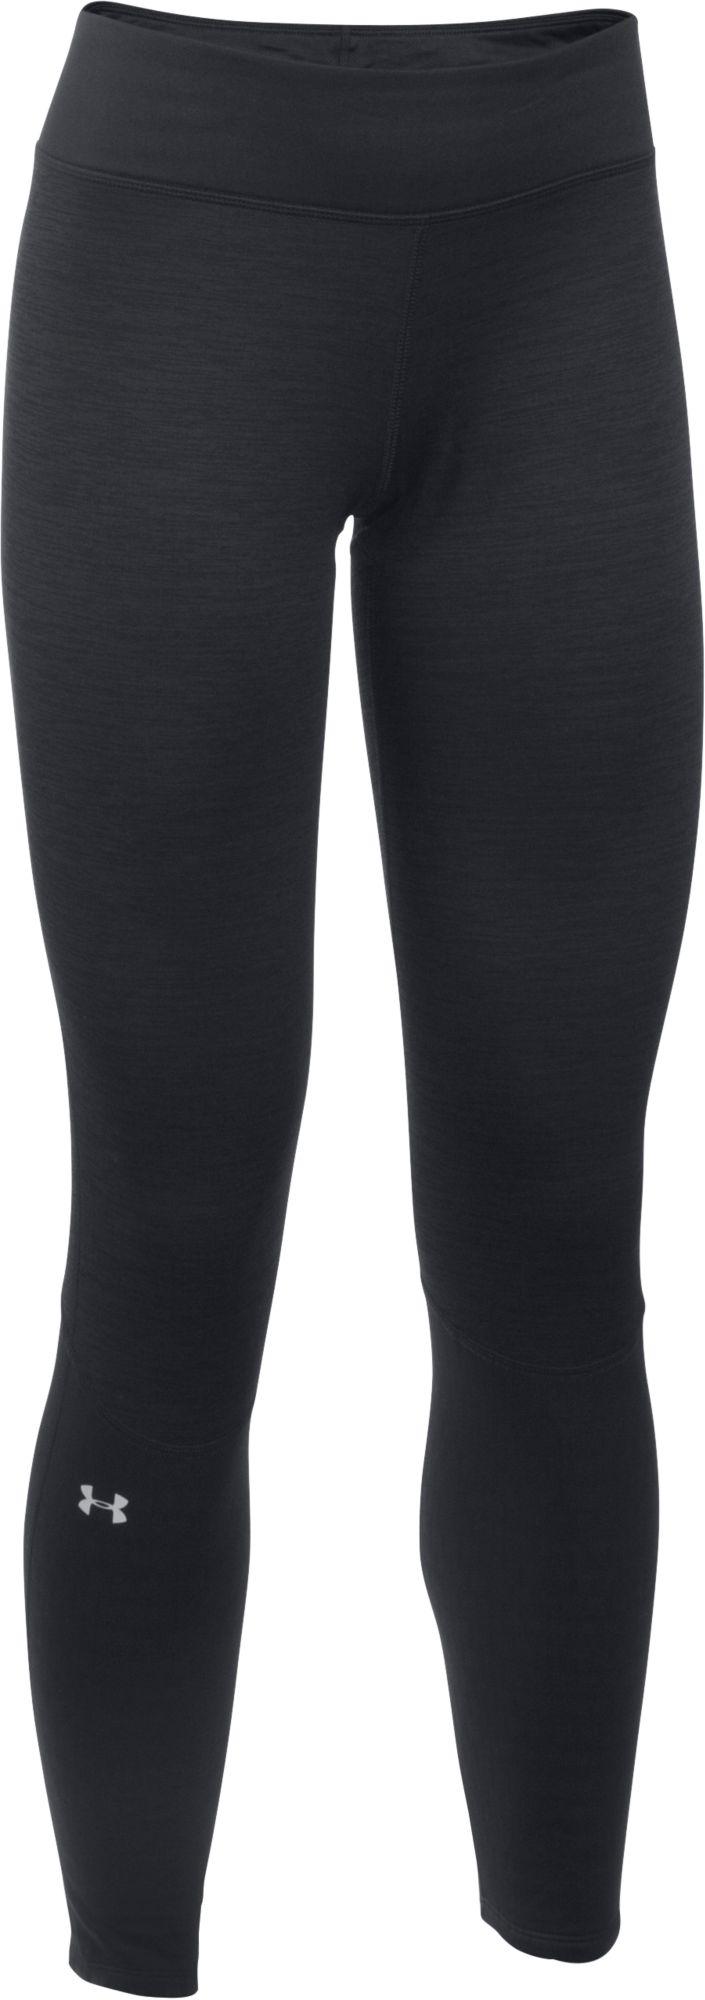 Under Armour Women's Base 4.0 Leggings, Size: Medium, Black thumbnail